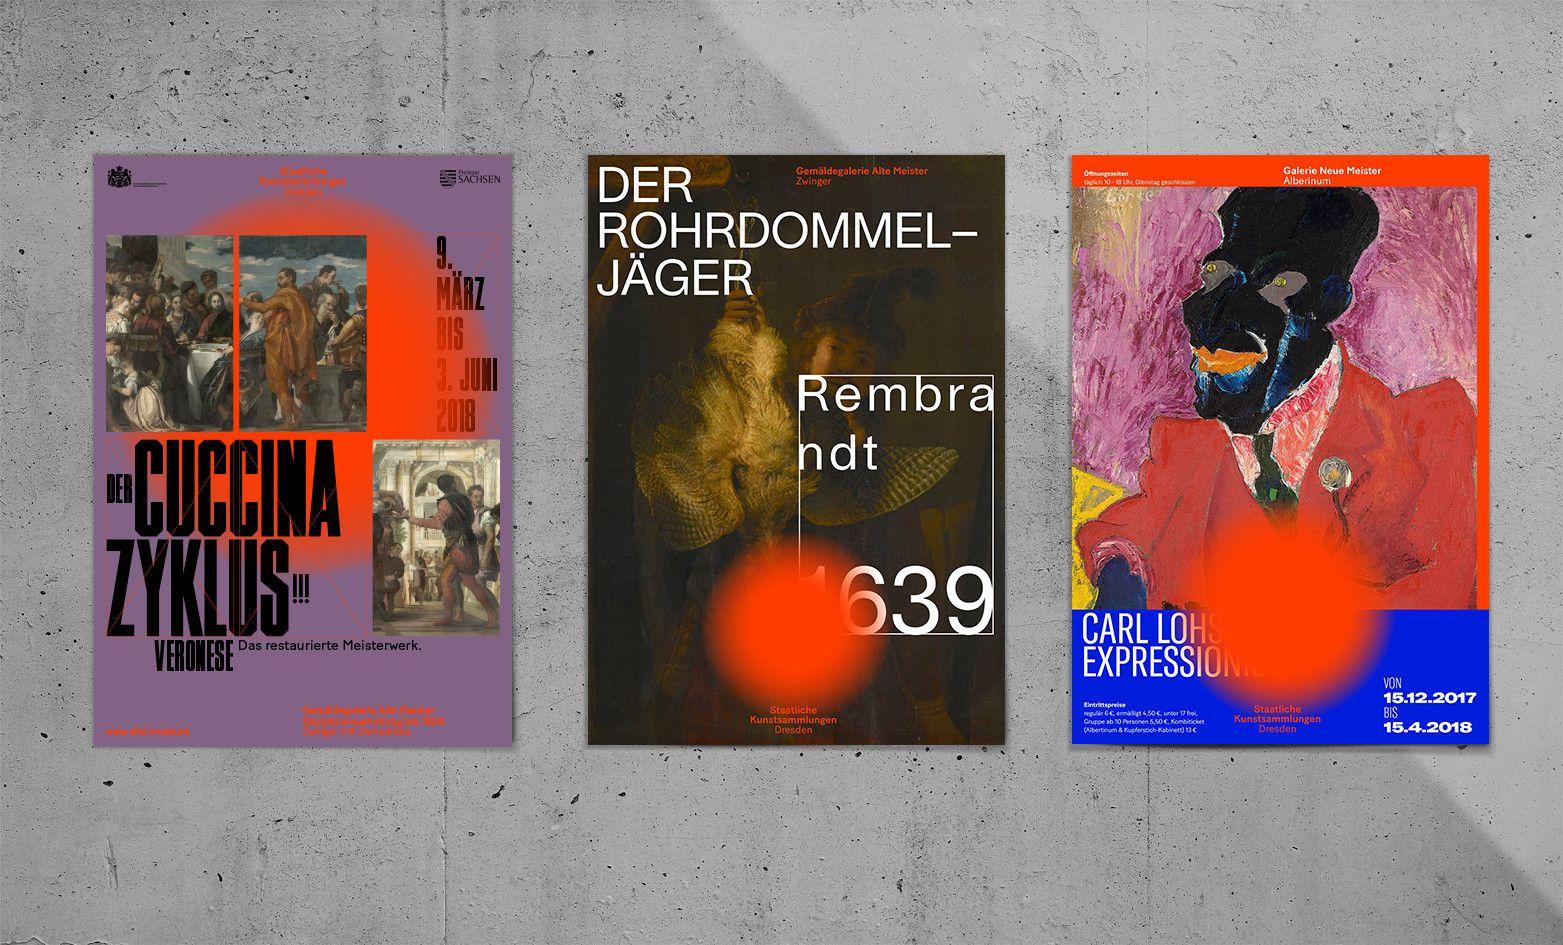 Staatliche Kunstsammlungen Dresden Stan Hema Agentur Fur Markenentwicklung Berlin Dresden Kunst Berlin